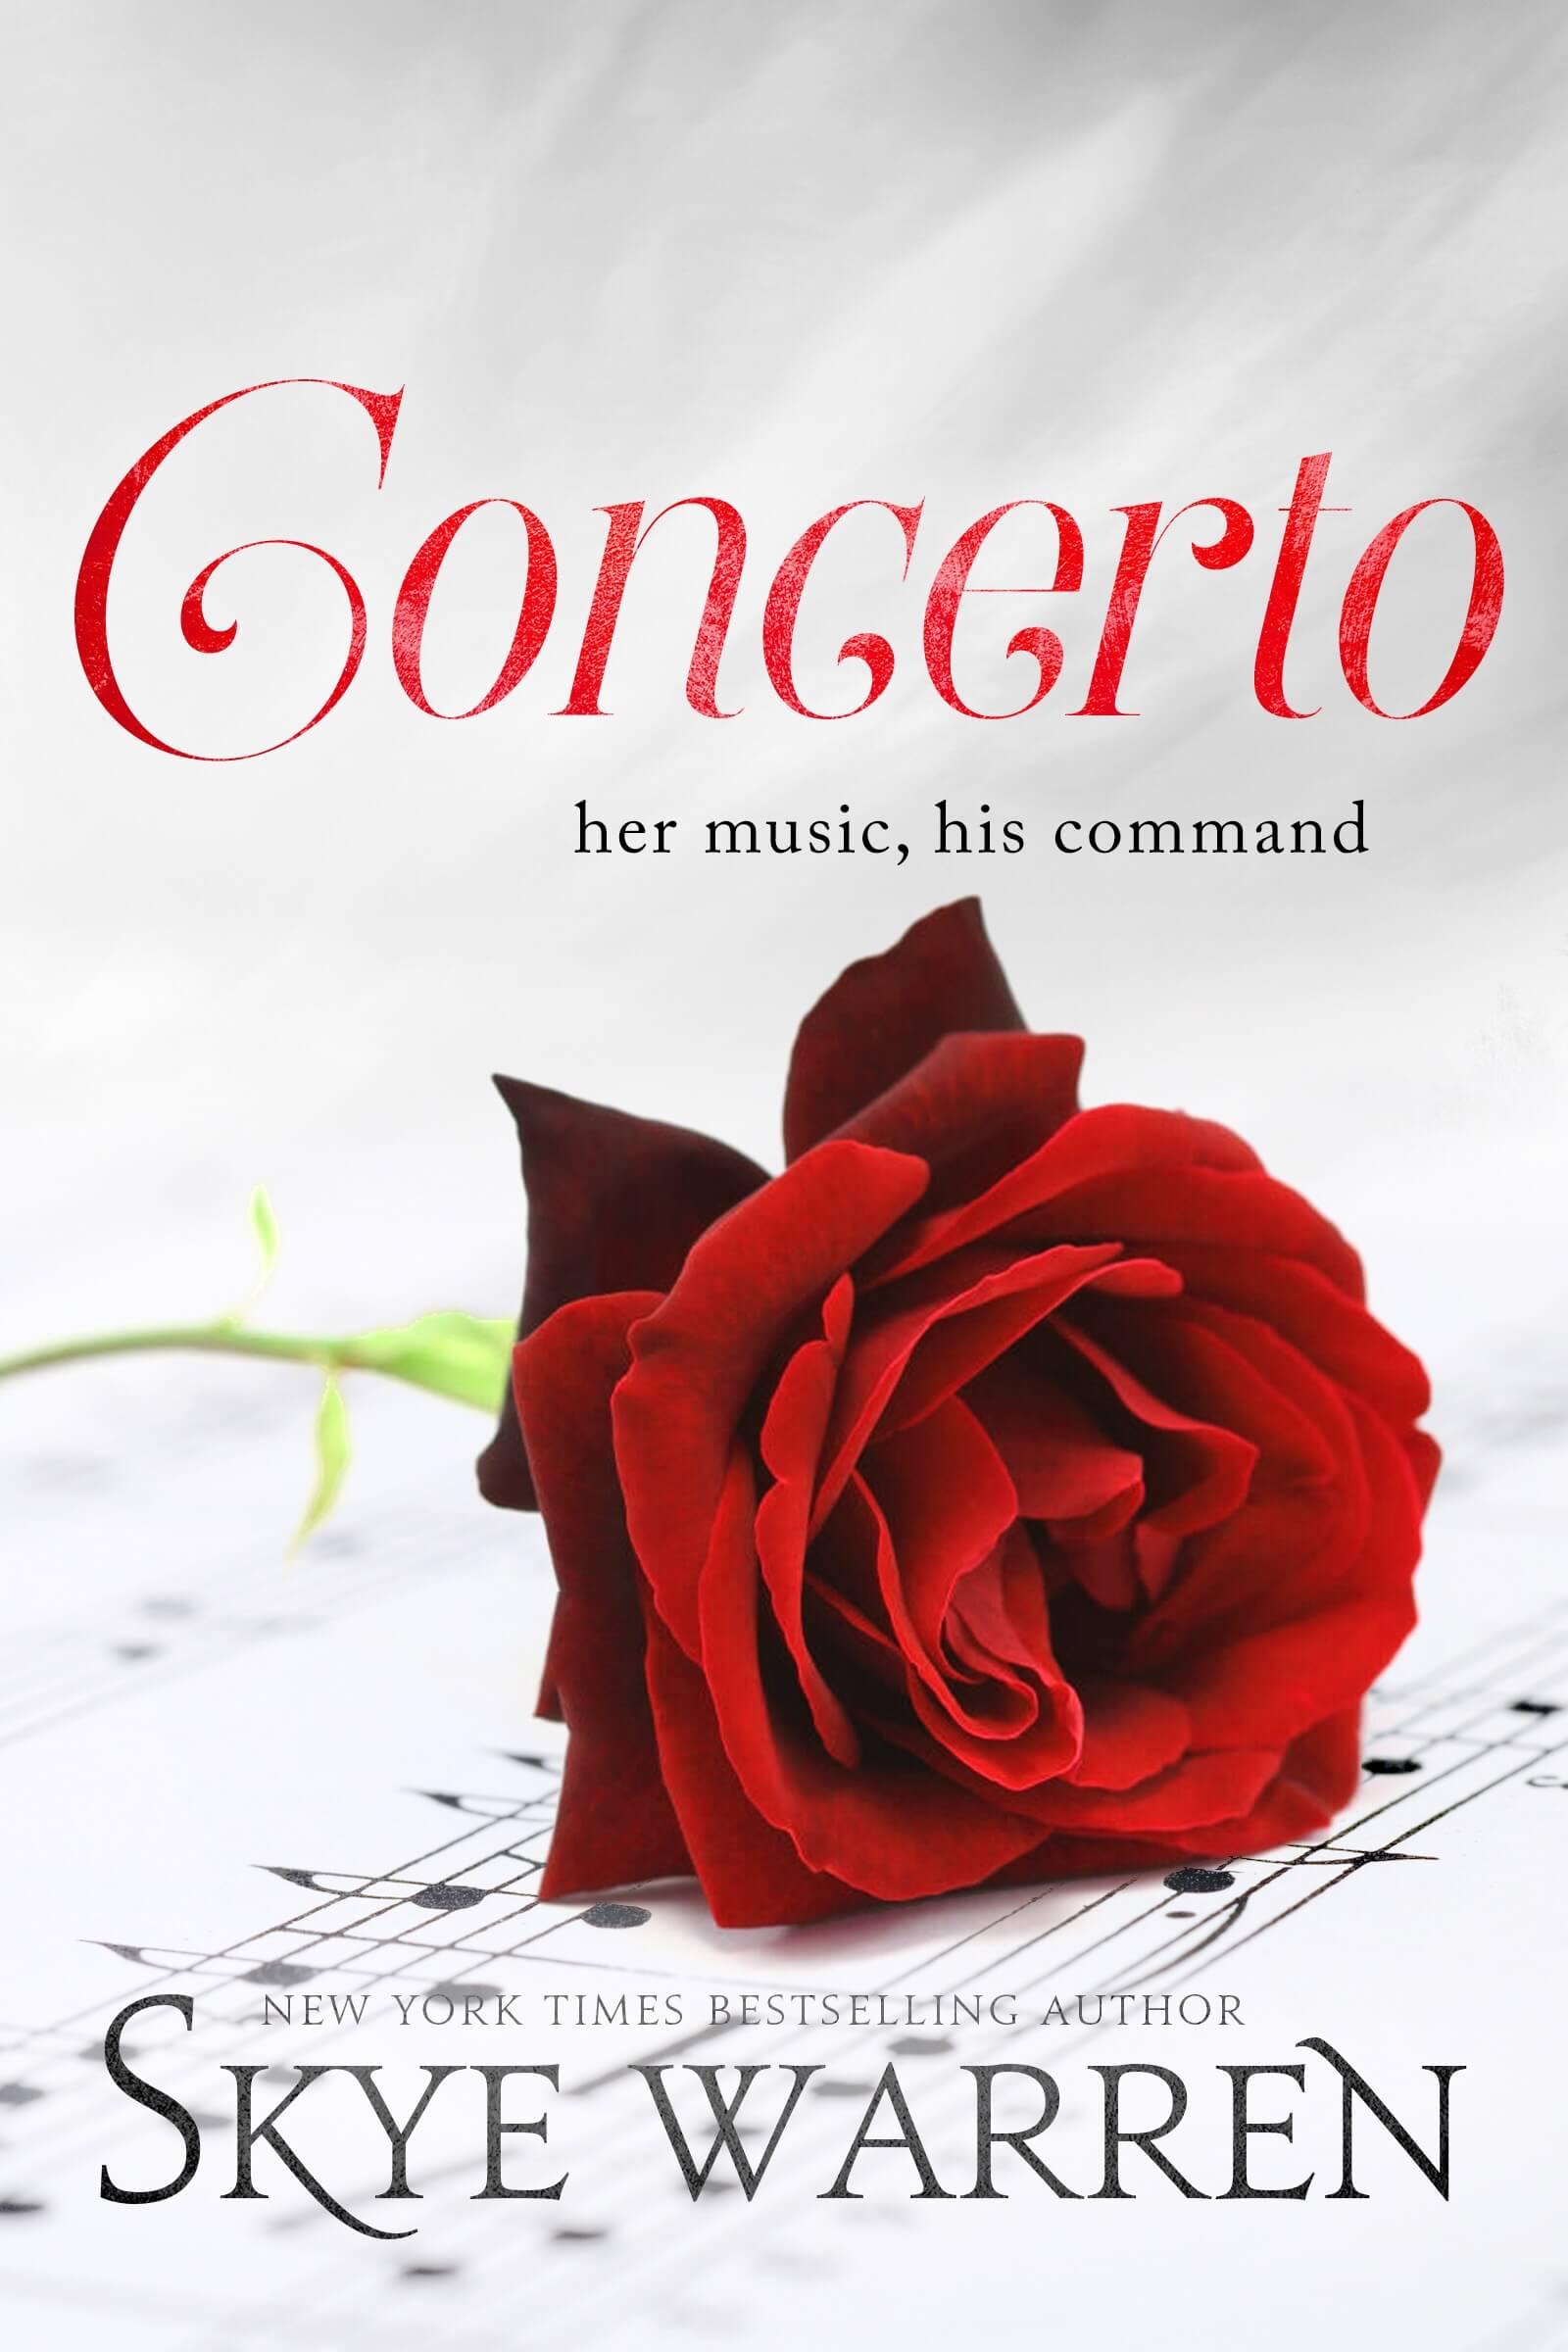 Blog Tour * Concerto (North Security book 2) by Skye Warren * Excerpt * Book Review